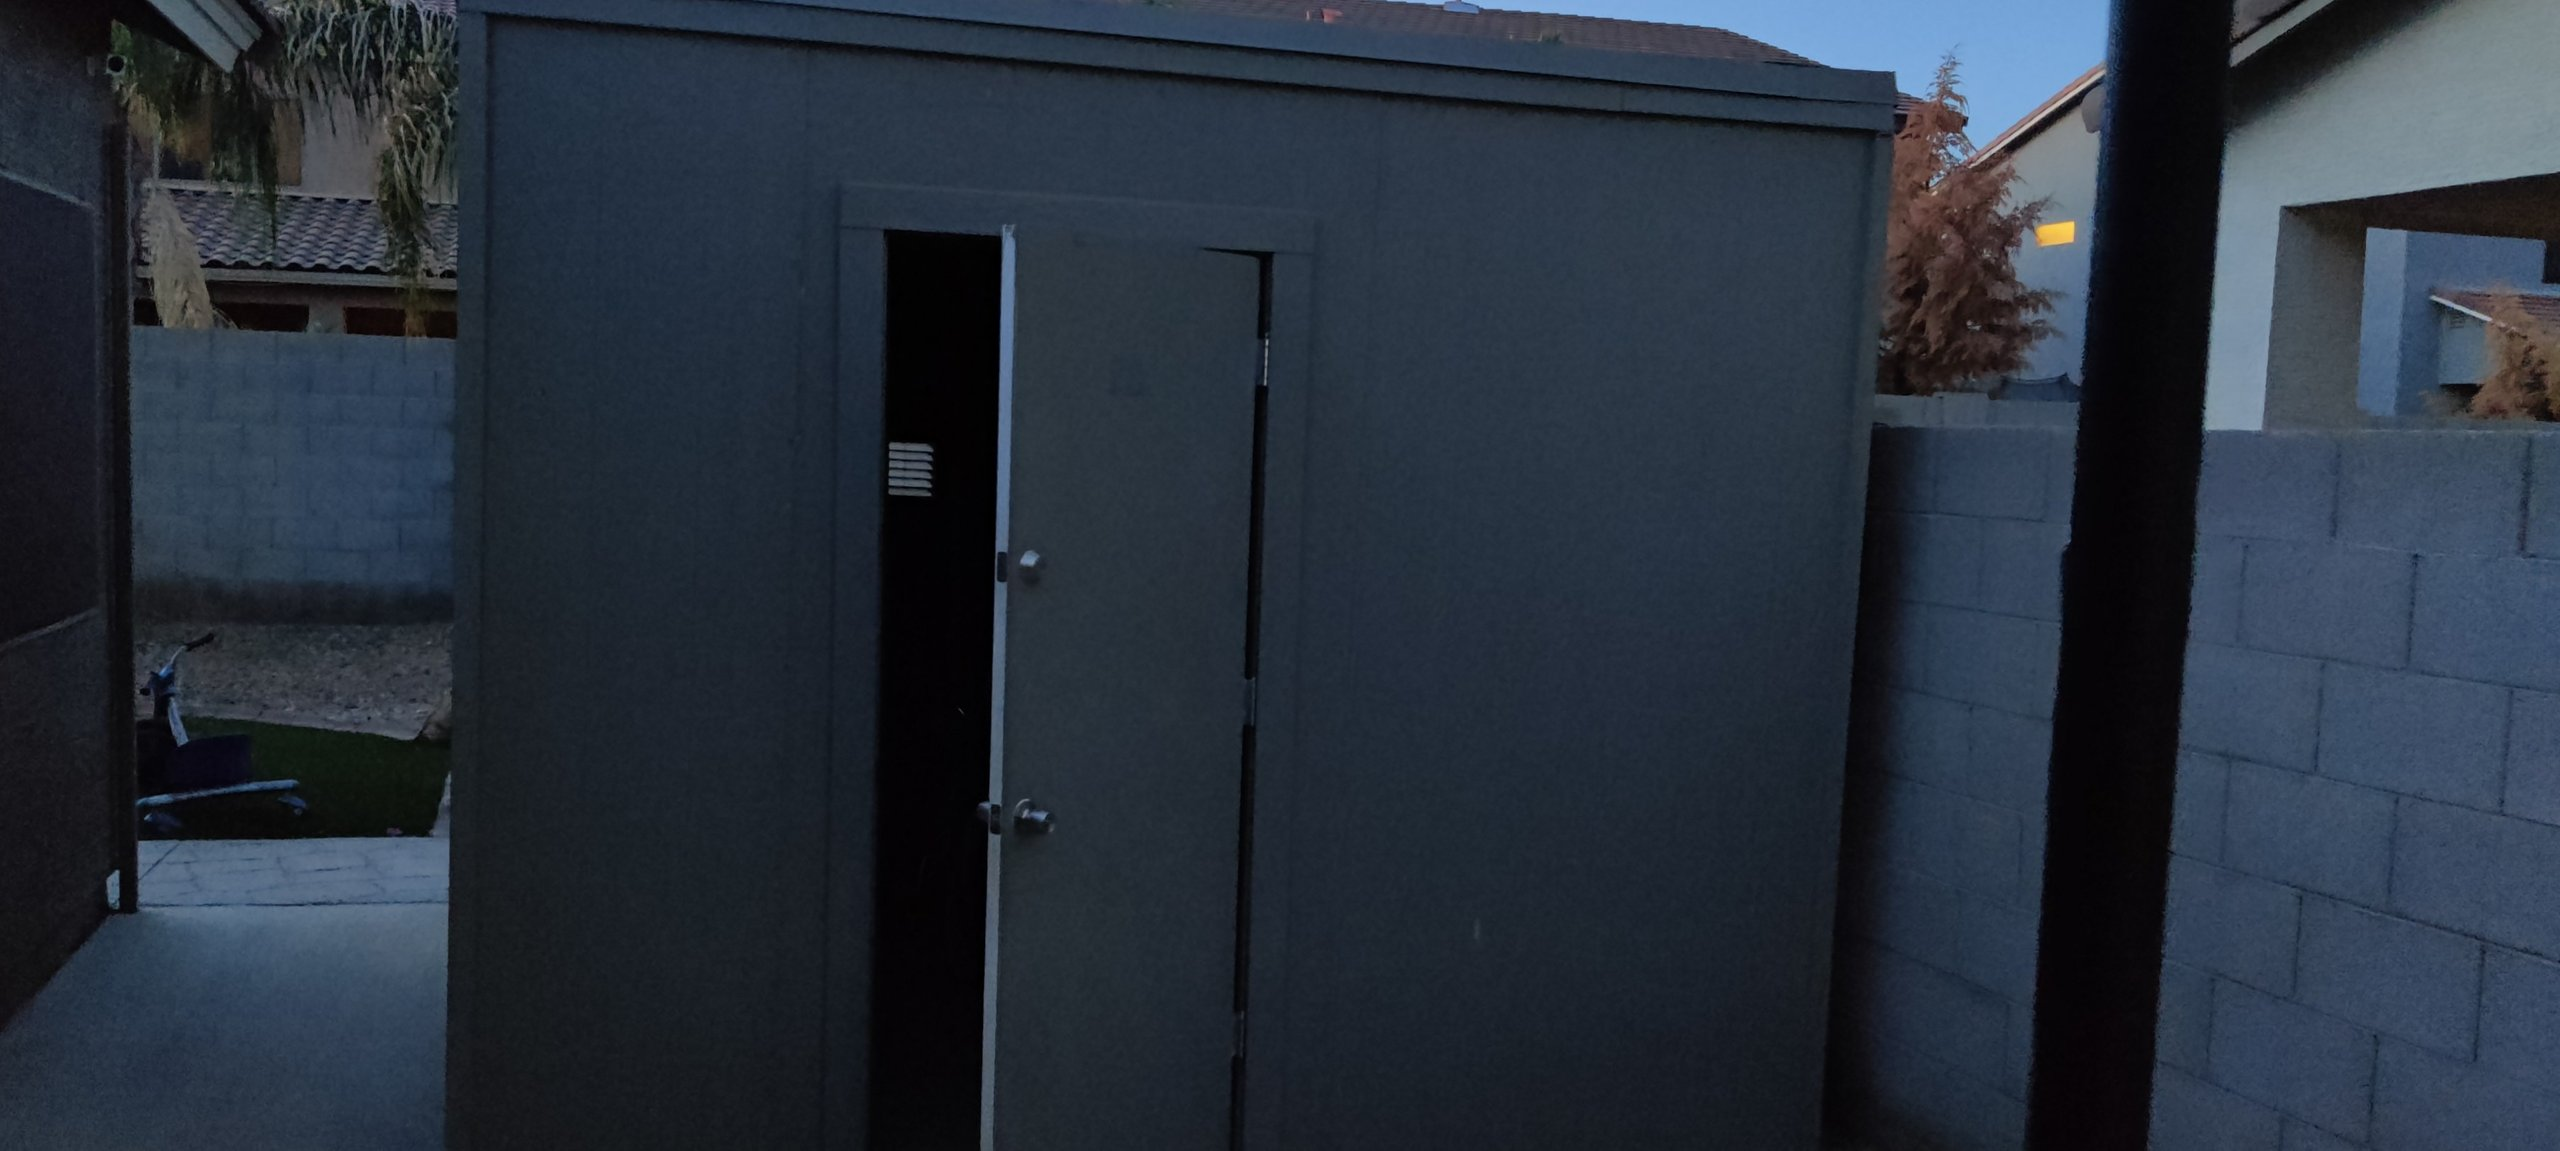 4x7 Shed self storage unit